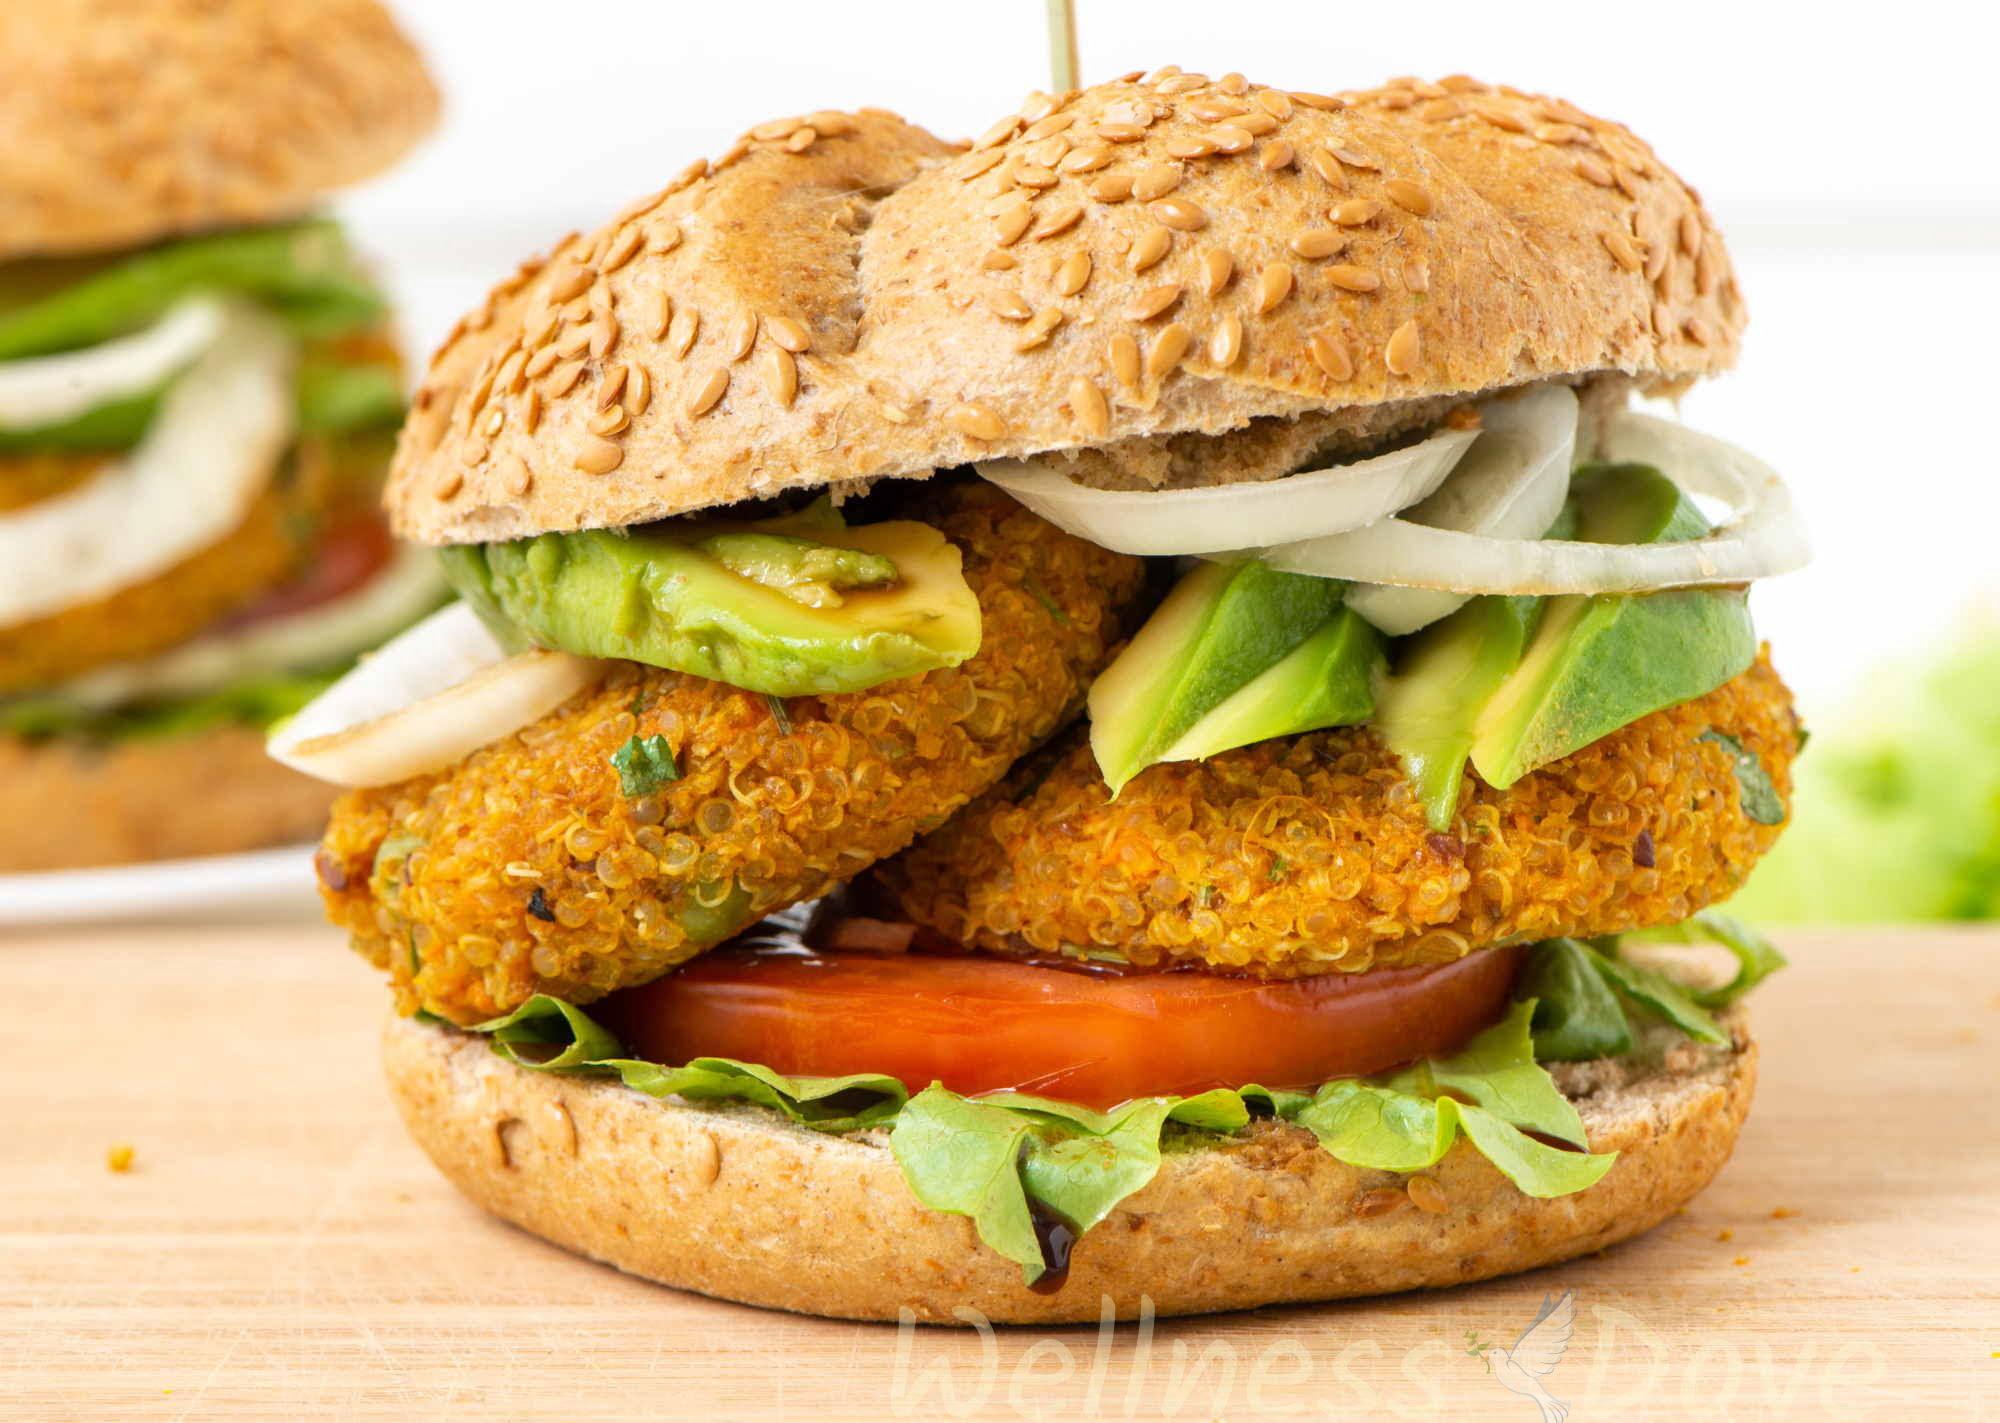 the vegan burger on a chopping board